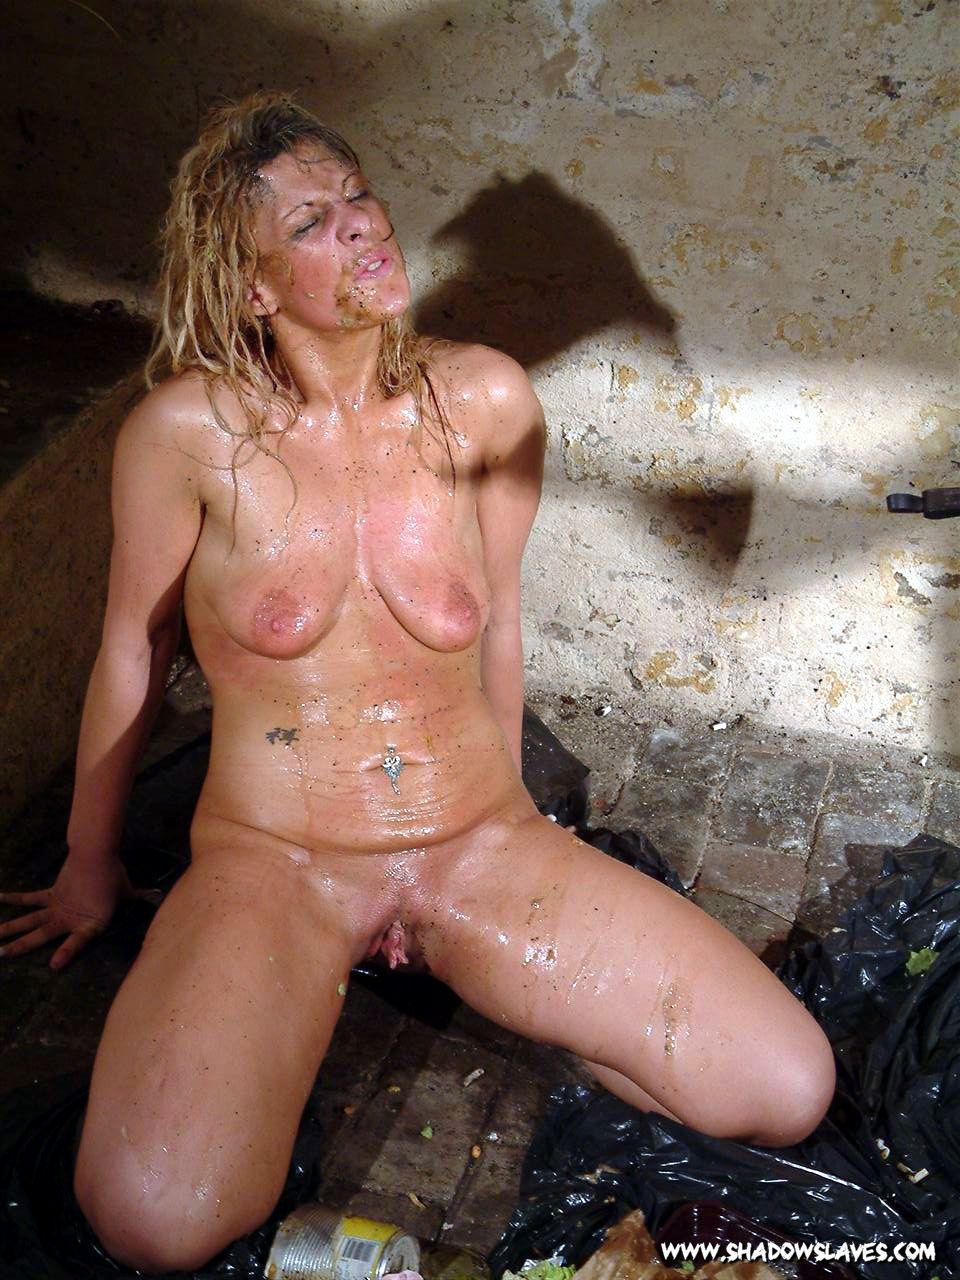 Shield reccomend Bdsm humiliation naked